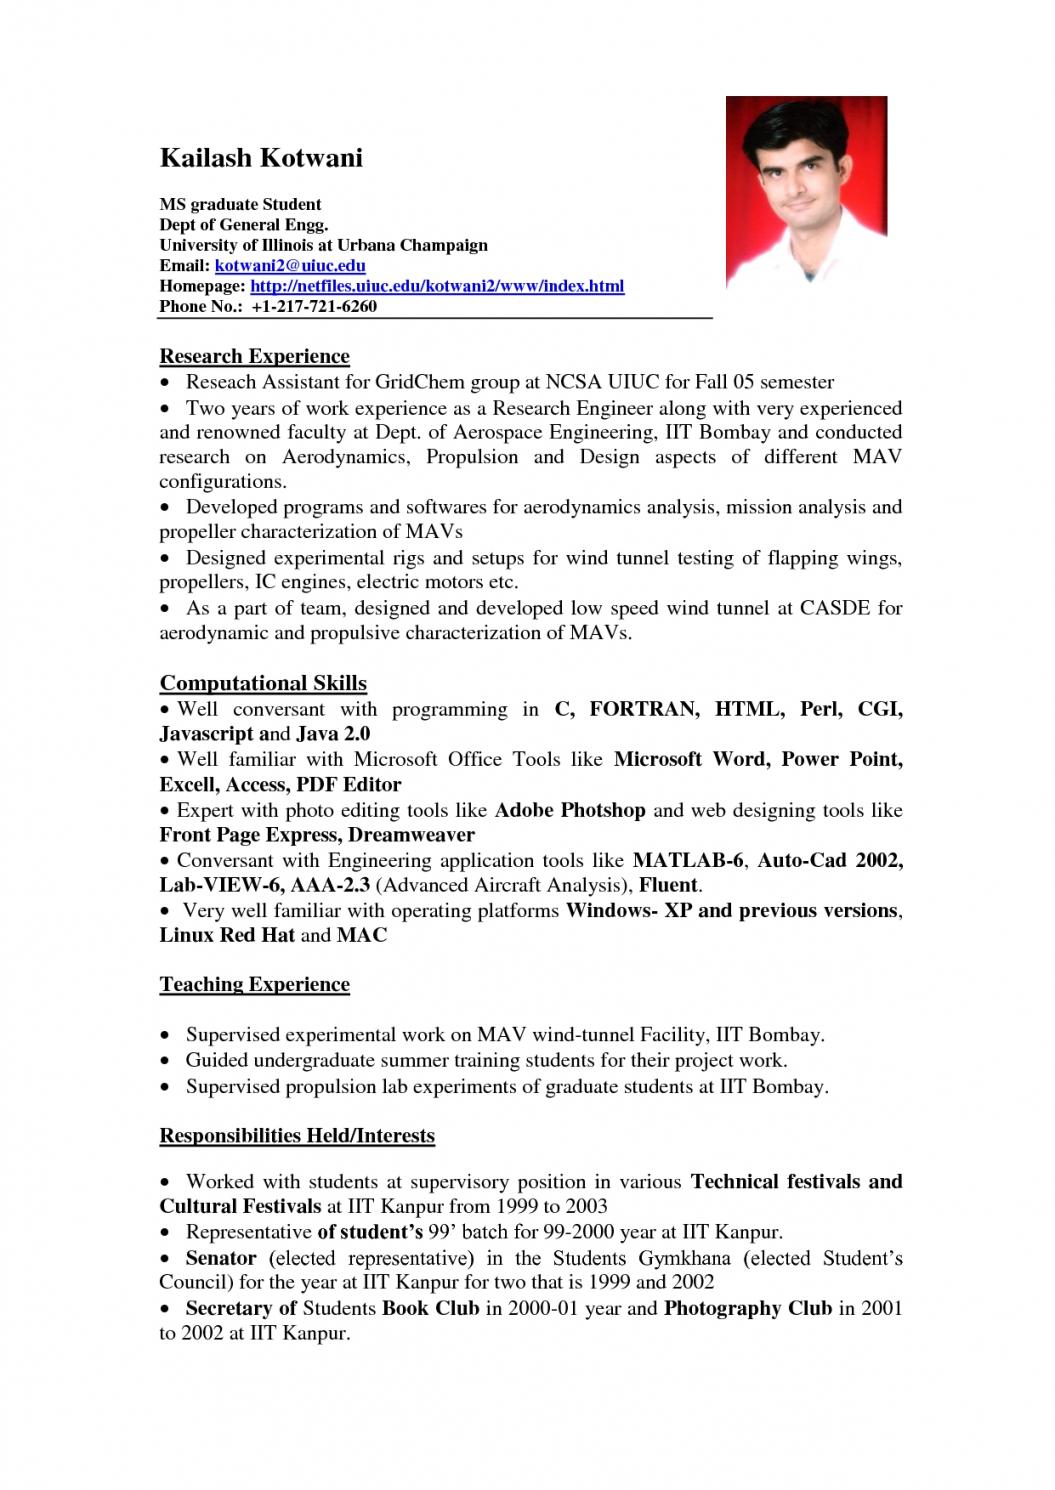 Resume Examples Job Experience